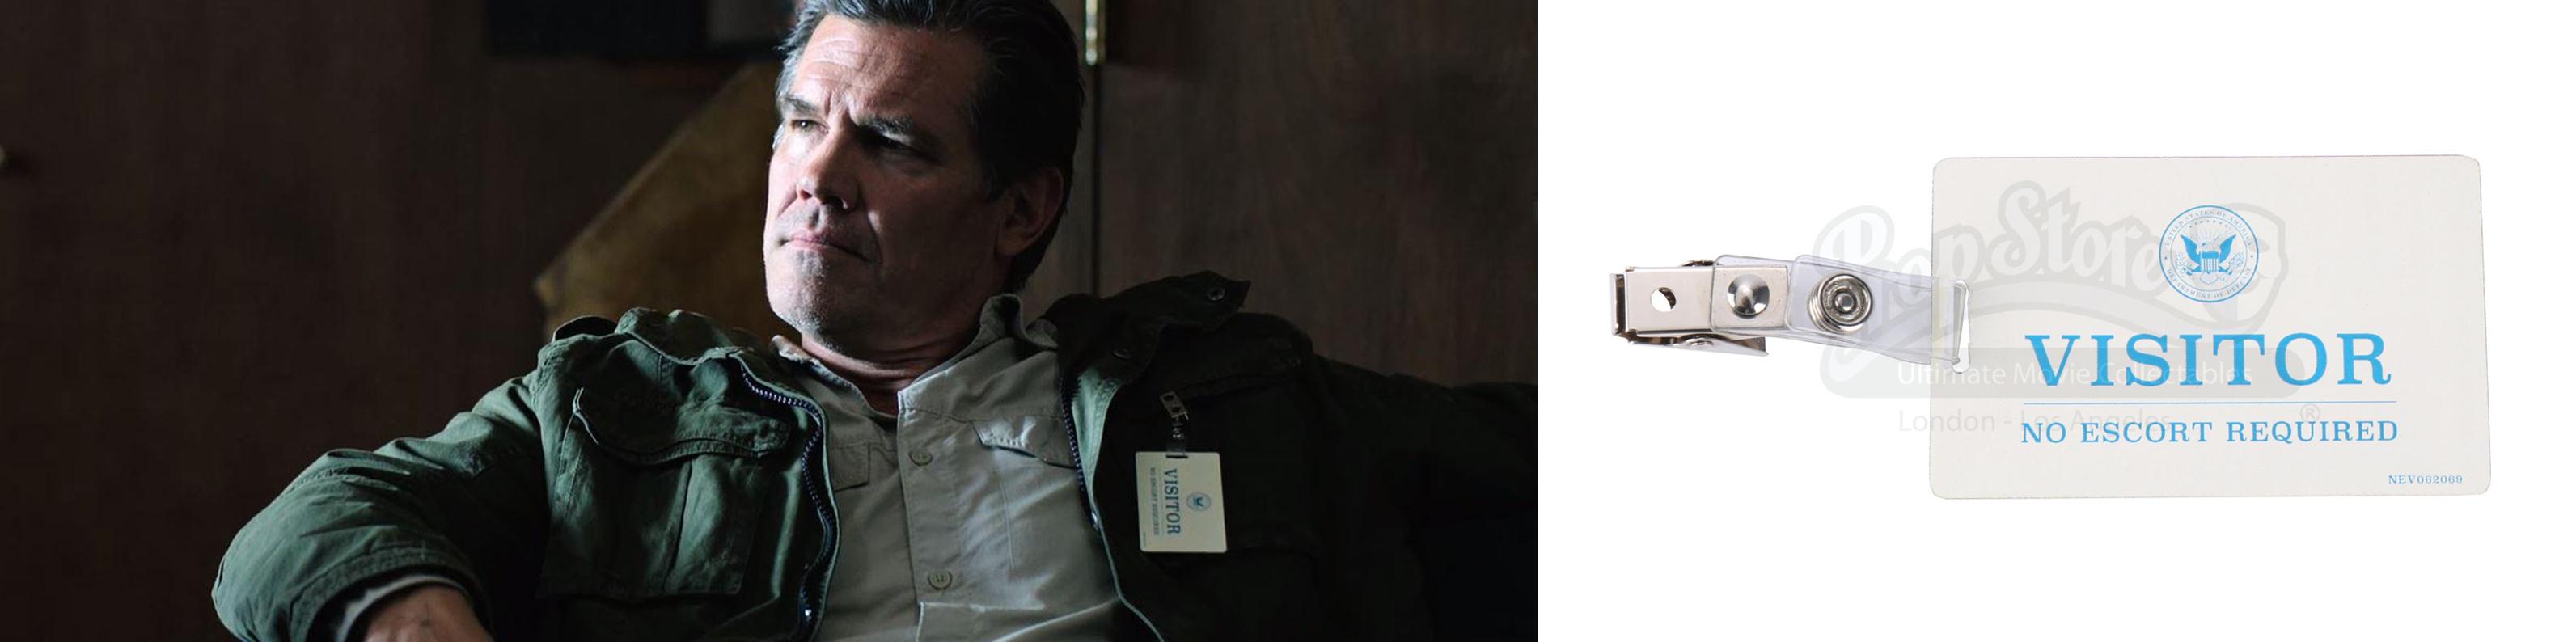 Matt Graver's (Josh Brolin) Visitor Badge. Photos: Prop Store